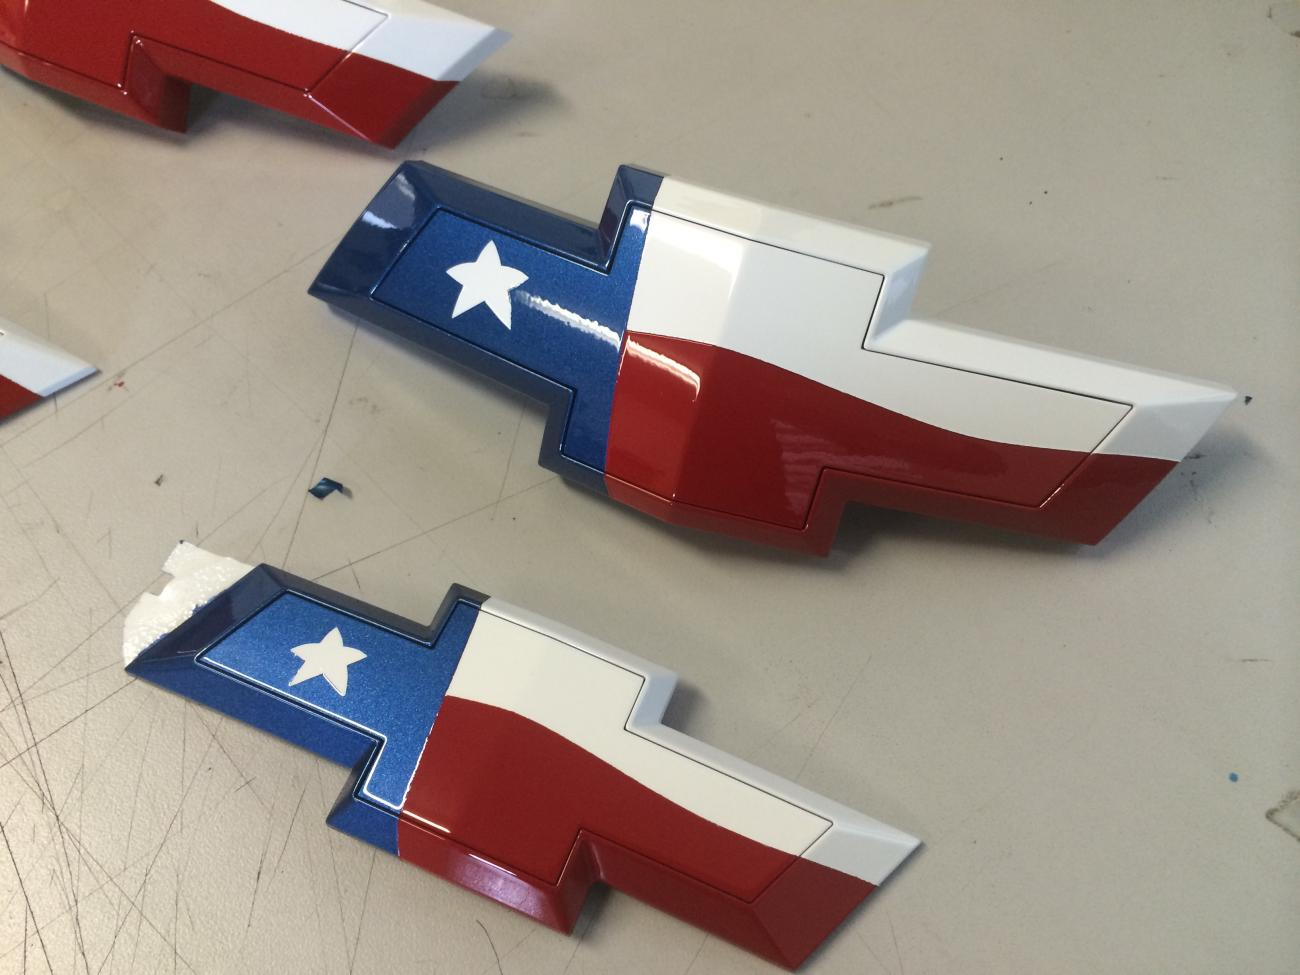 Custom painted texas flag bowties page 3 camaro5 chevy camaro forum camaro zl1 ss and v6 forums camaro5 com